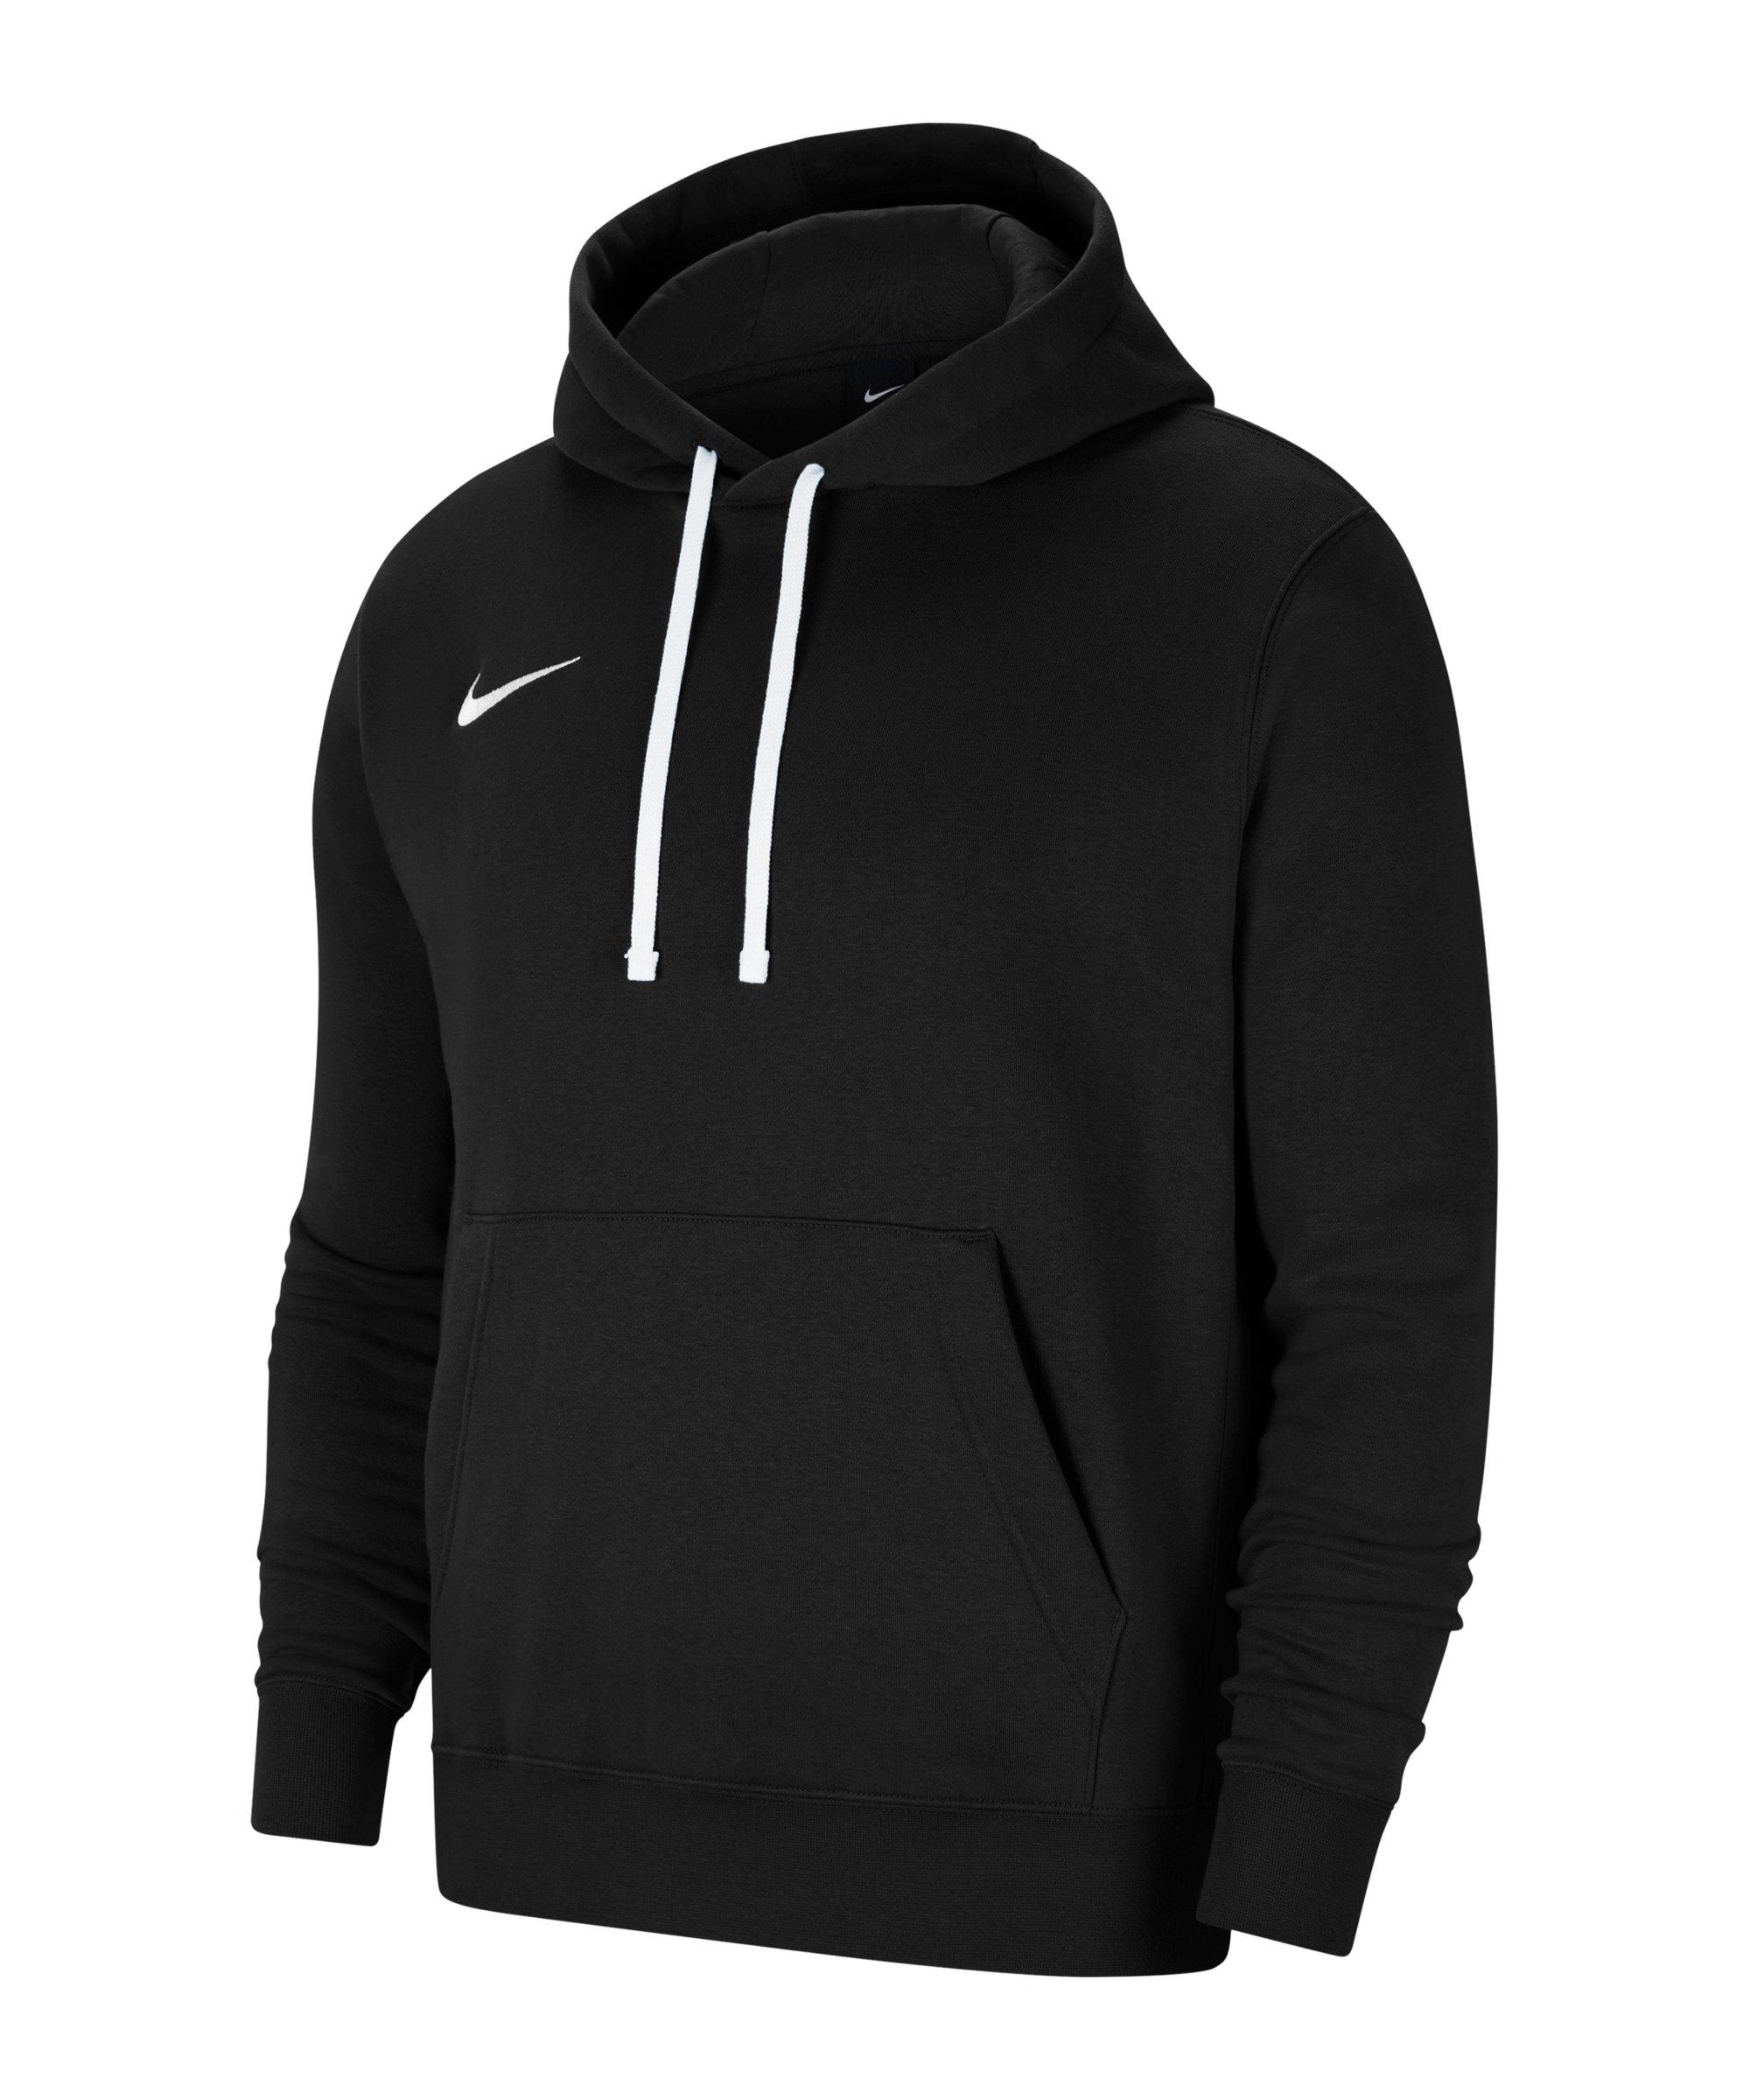 Nike Park 20 Fleece Hoody Schwarz Weiss F010 - schwarz